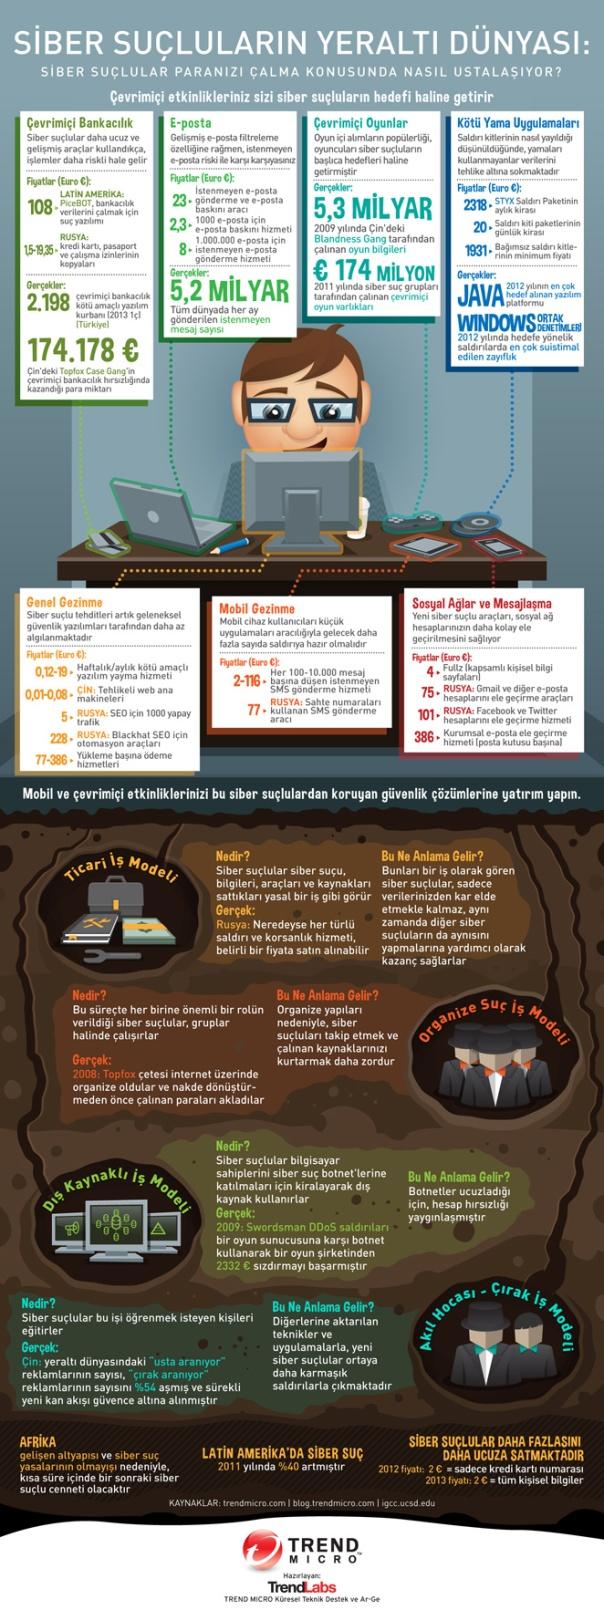 infographic-cybercriminal-underground-tr